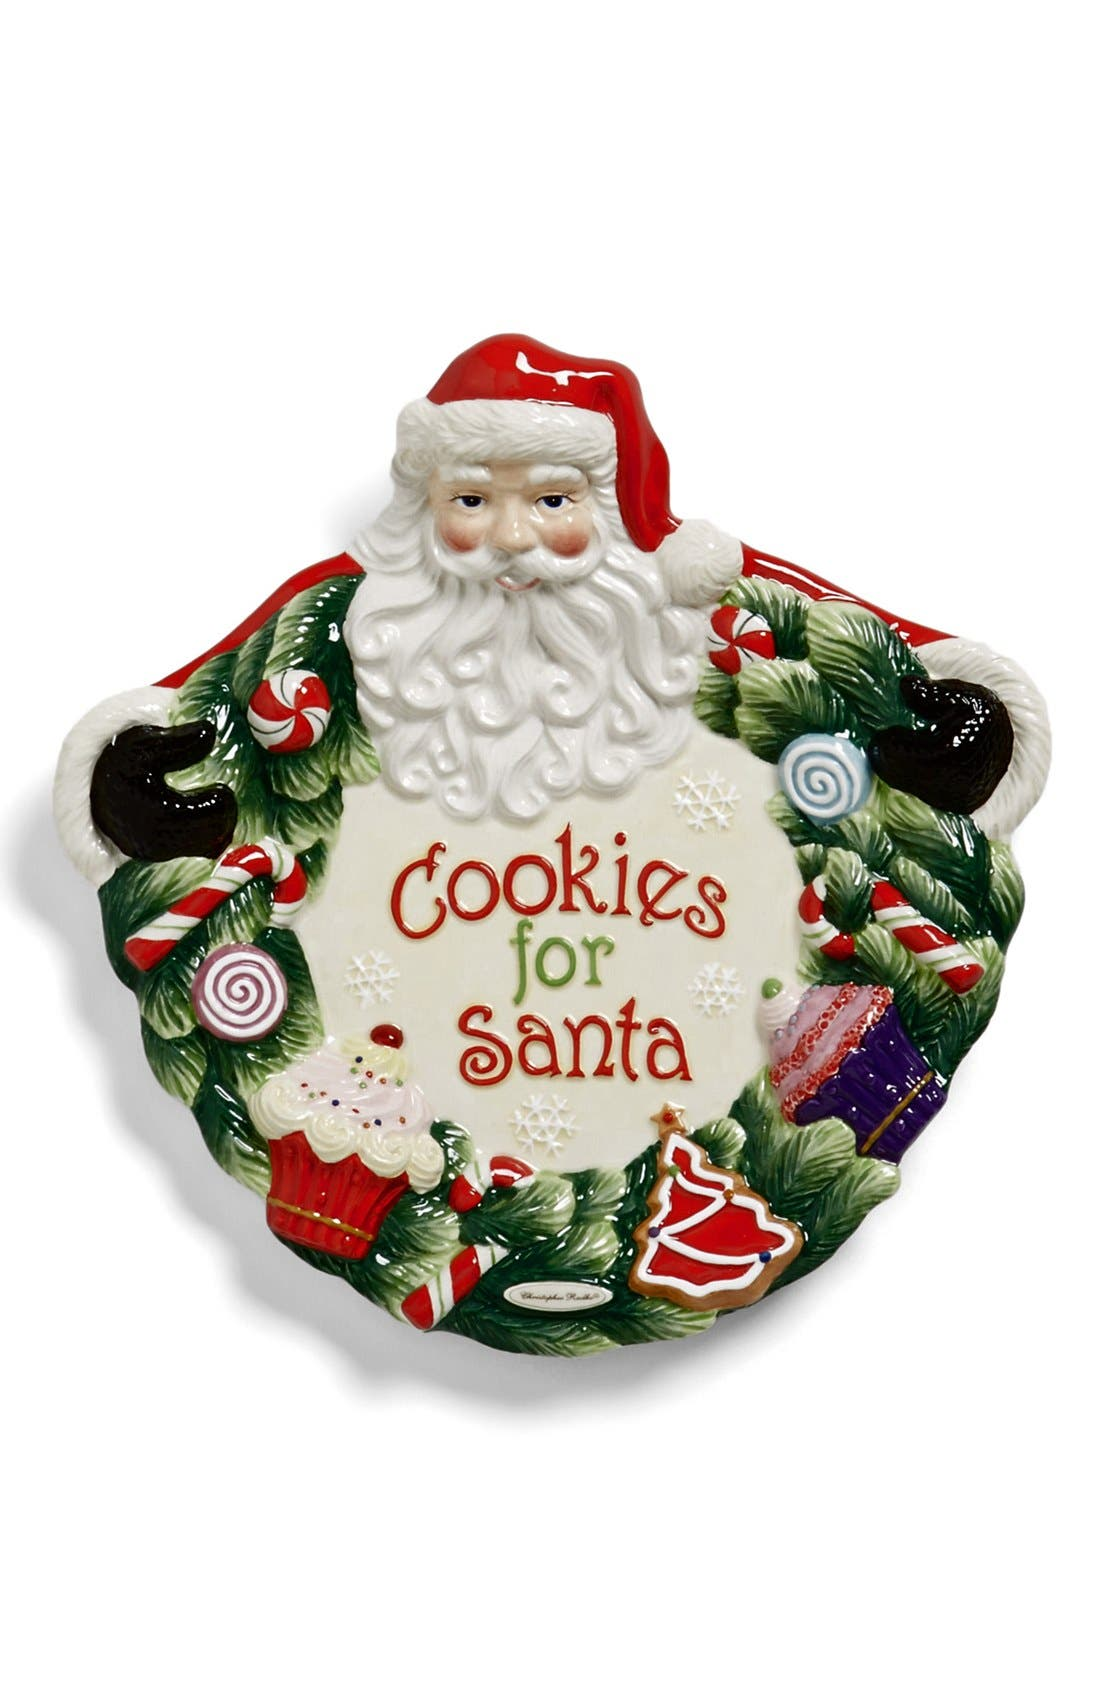 Main Image - Christopher Radko 'Cookies for Santa' Ceramic Plate